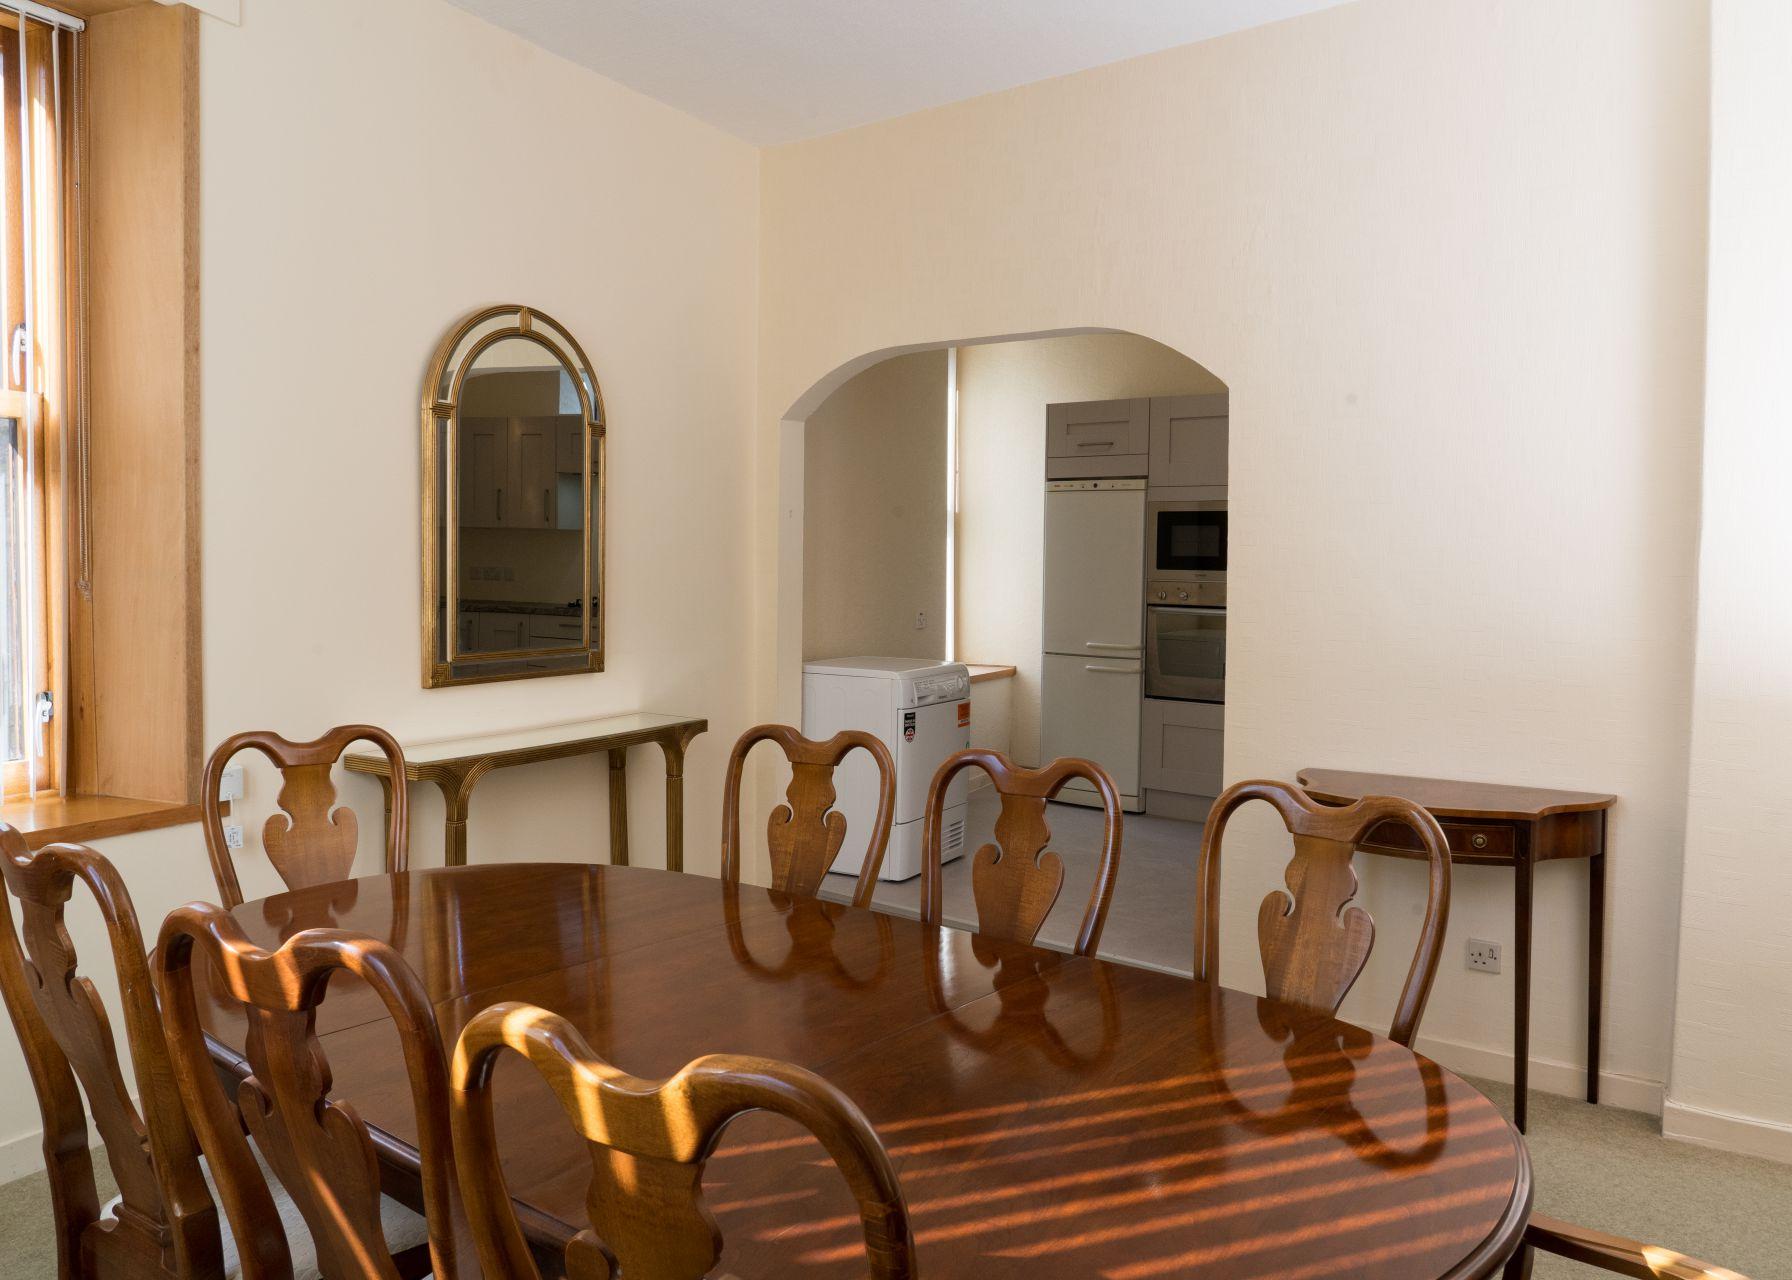 ARD-Properties-Development-Sites-Buy-Homes-Rent-Aberdeenshire-Rentals-2a-St-Andrew-Streeet-Peterhead-Banner (7)